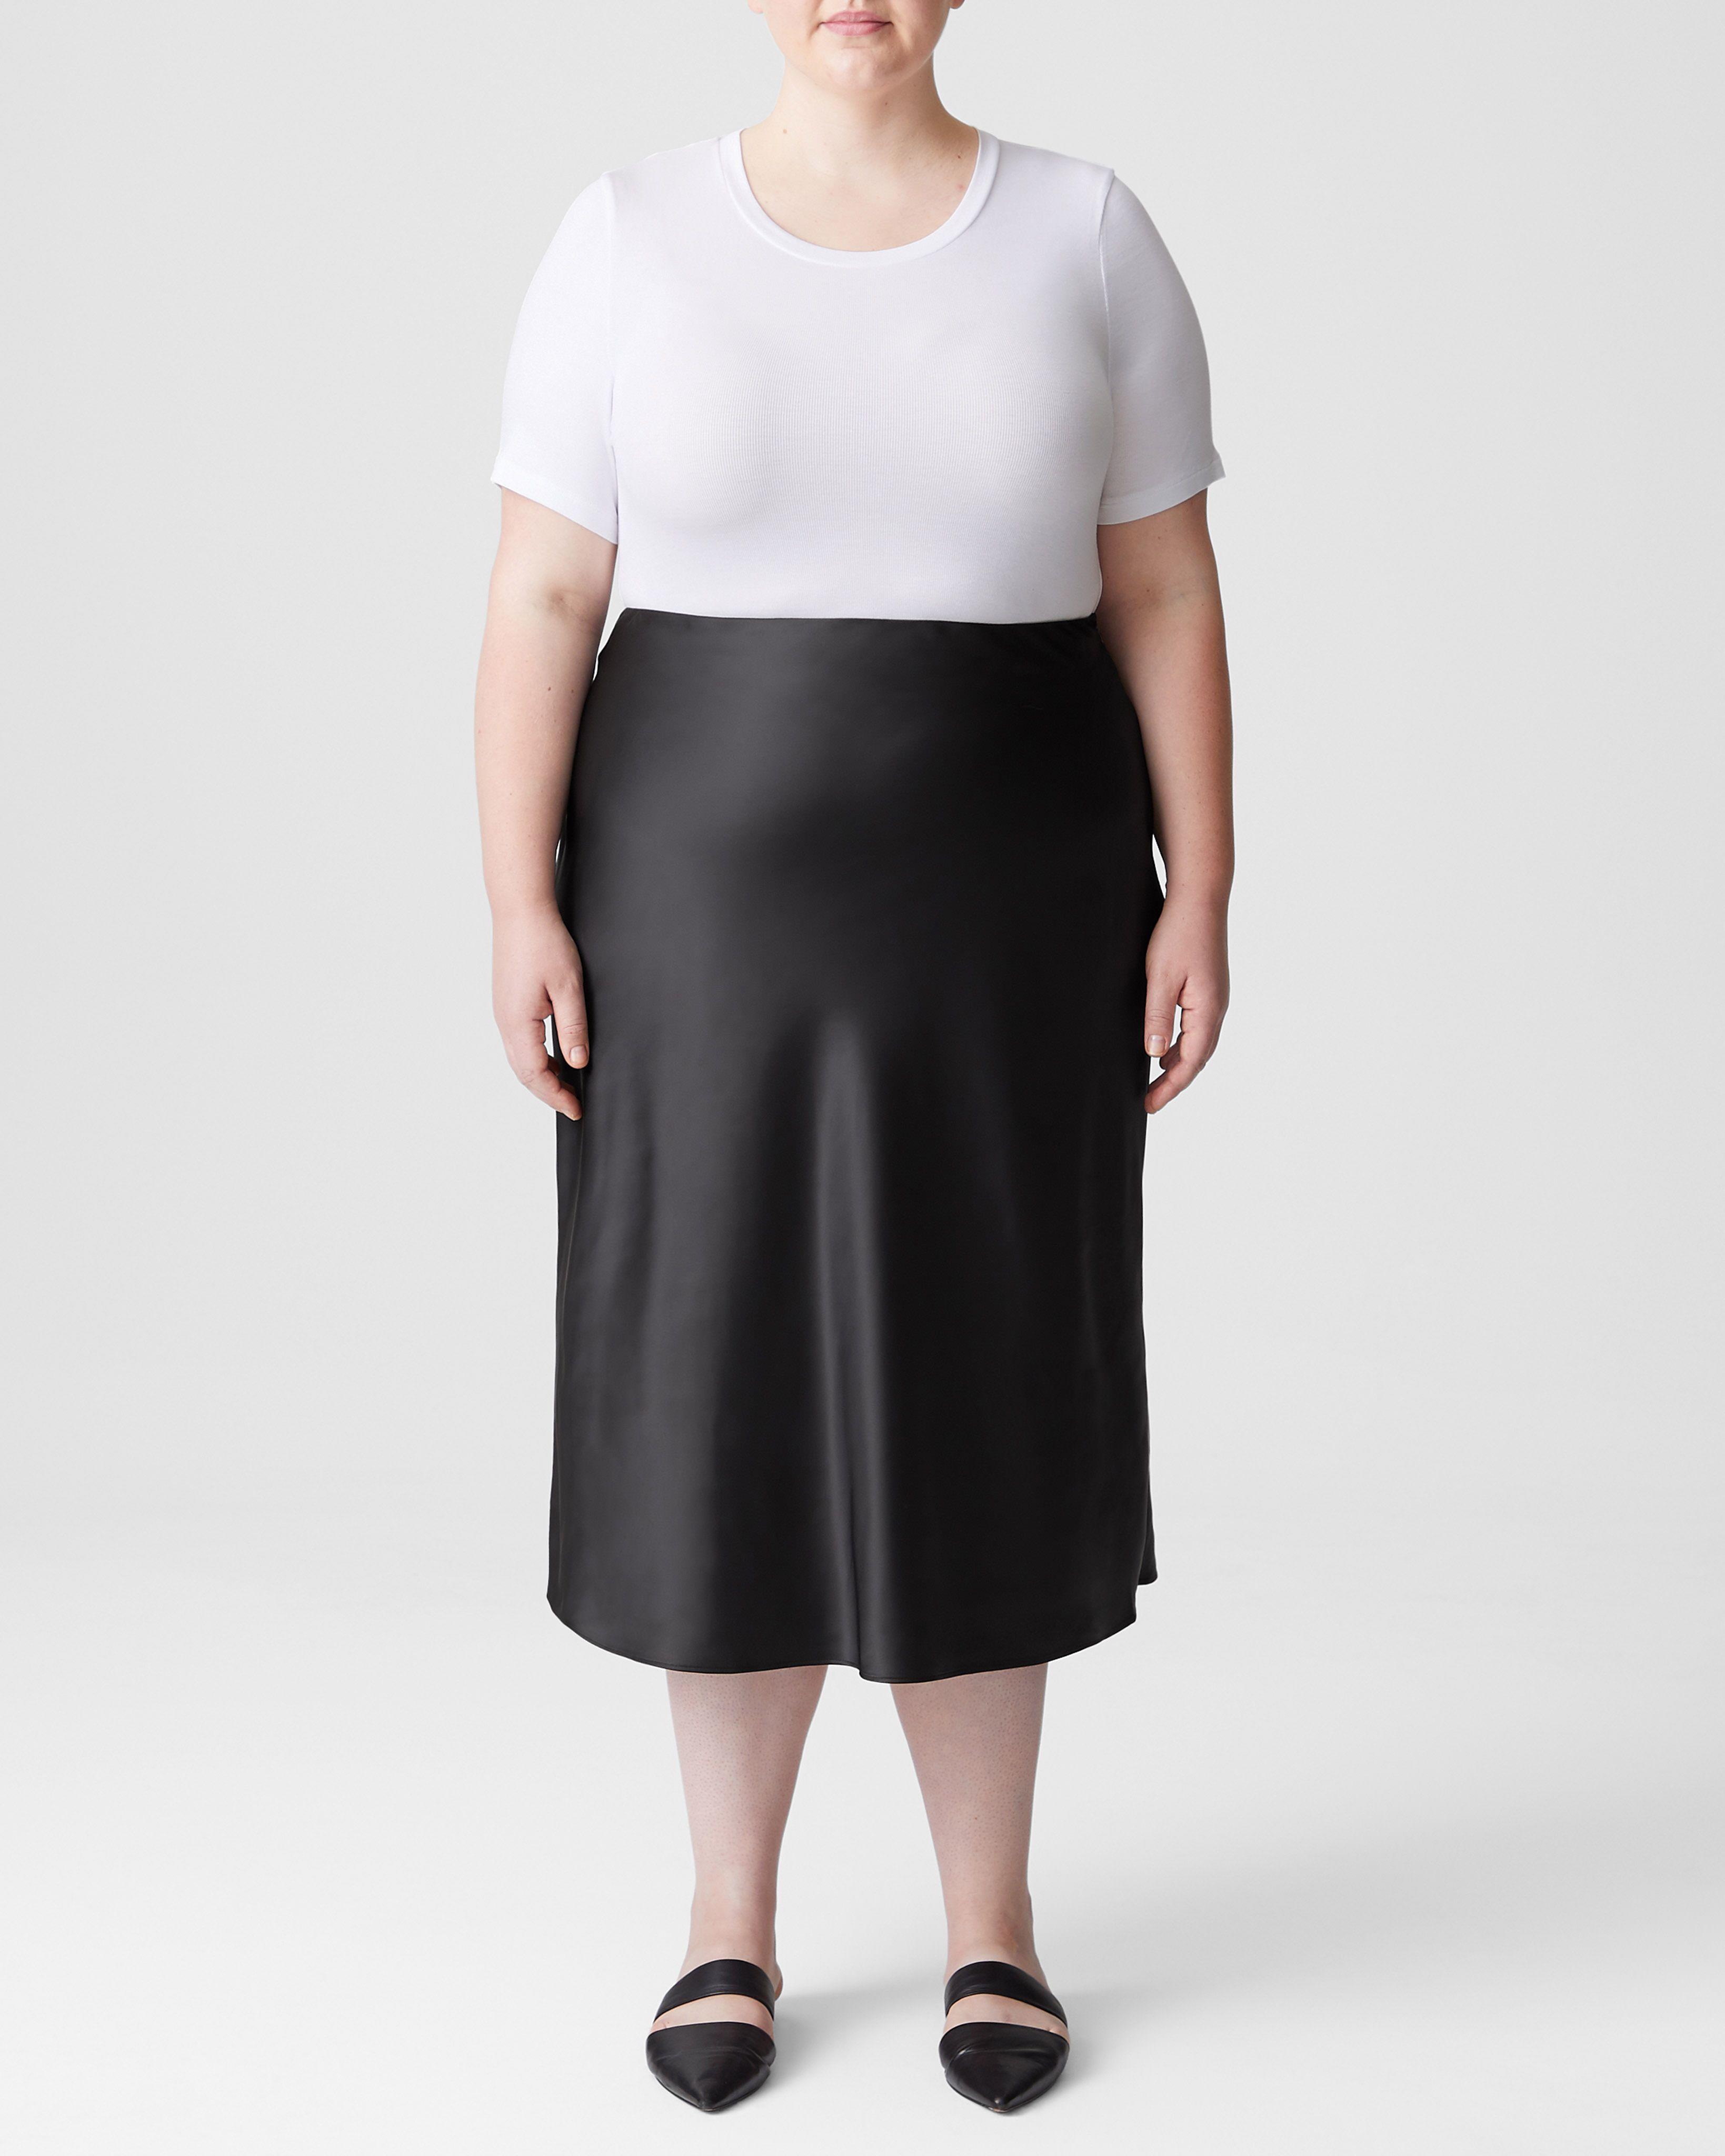 CeeCee Midi Bias Skirt - Black